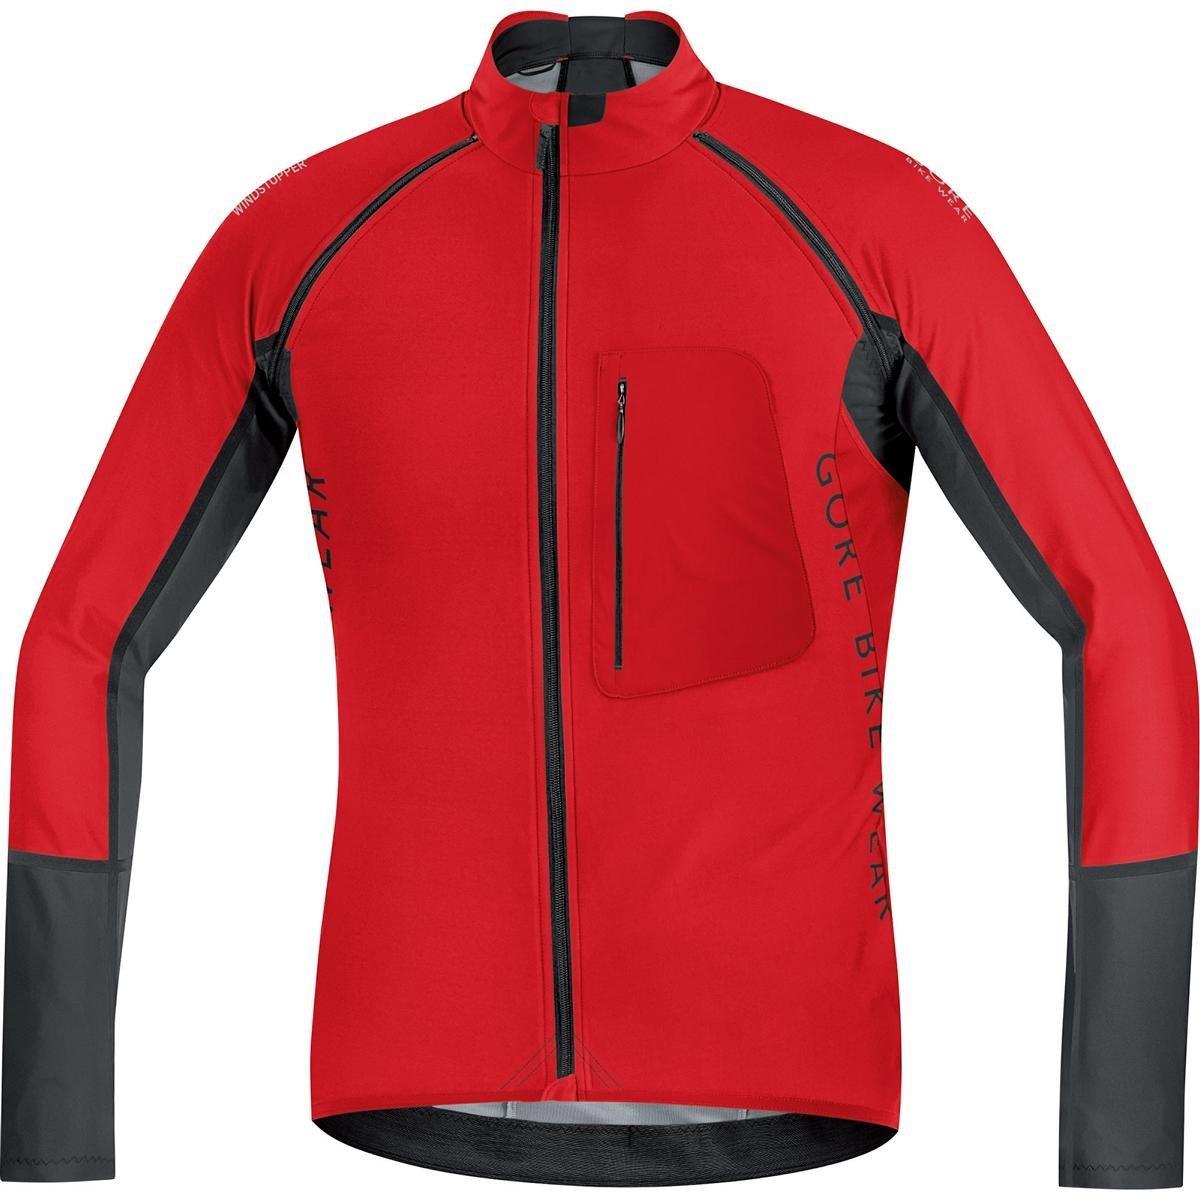 GORE BIKE WEAR Hombre Maillot de ciclismo ALP X PRO WINDSTOPPER Soft